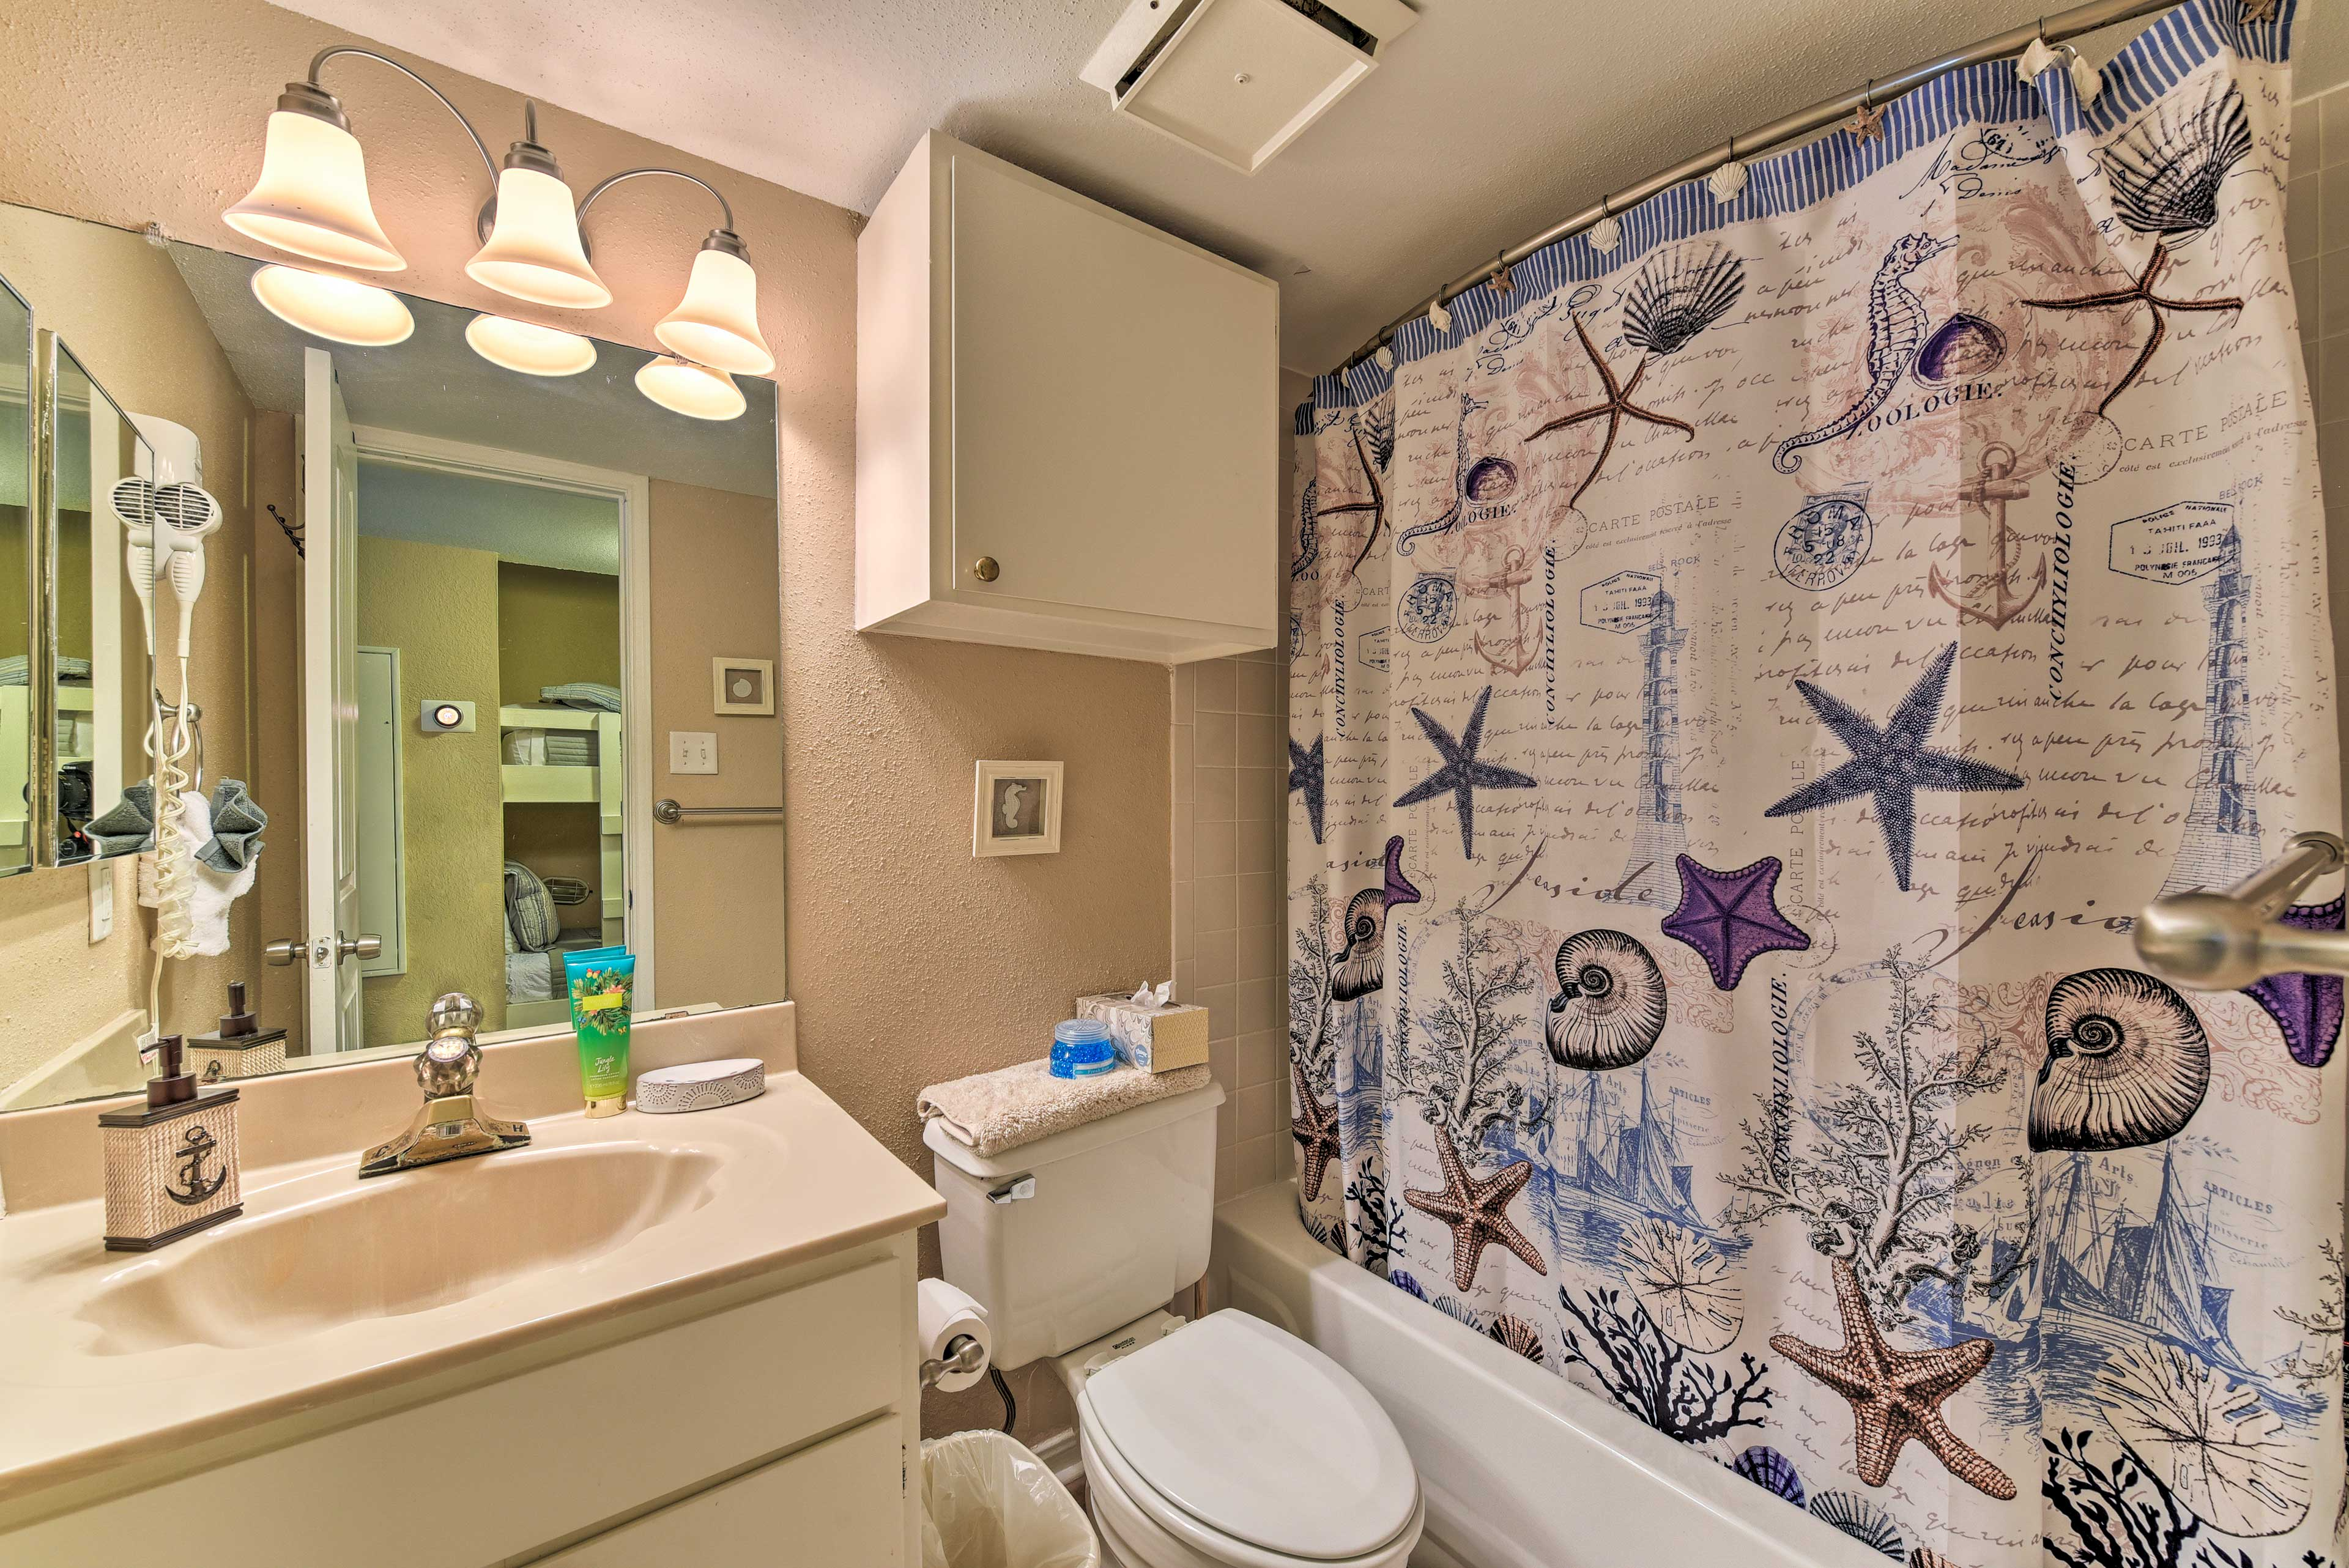 The full bathroom boasts a shower/tub combo and fresh towels.